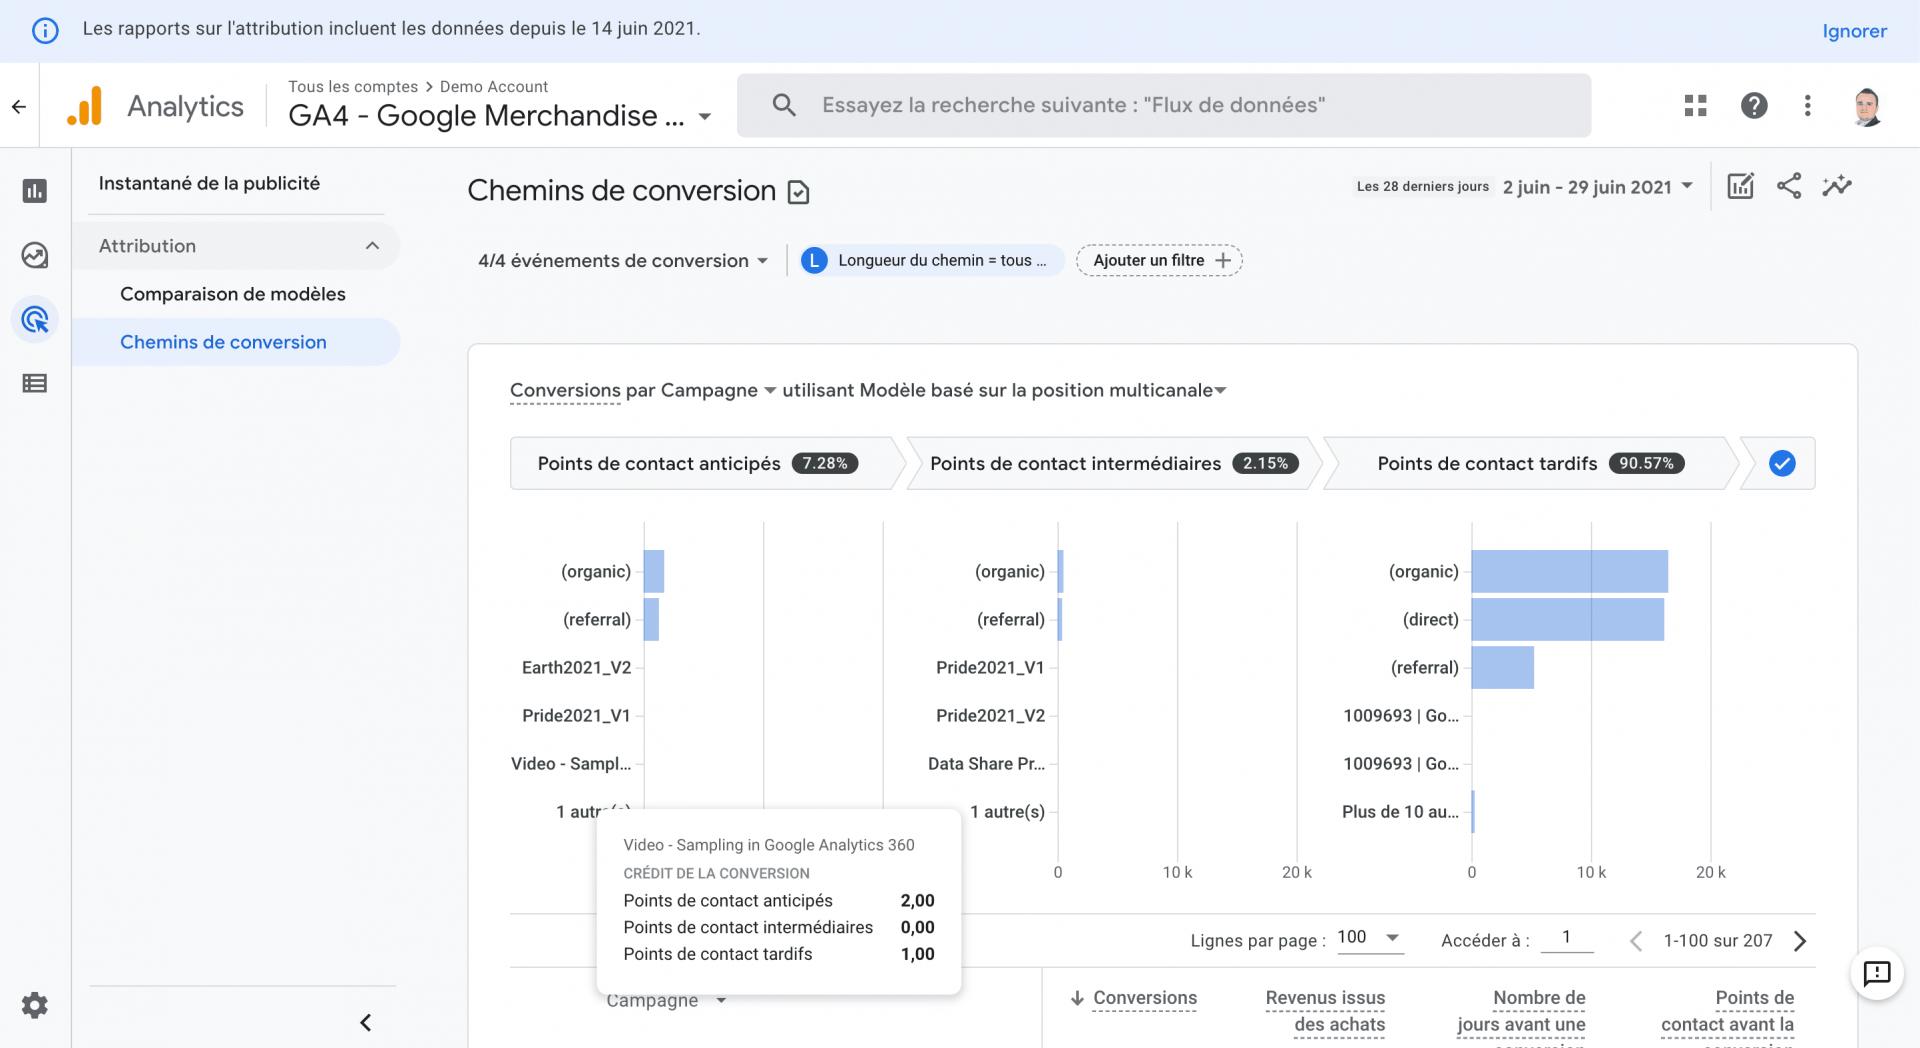 Miseajour analytics4 chemin conversion